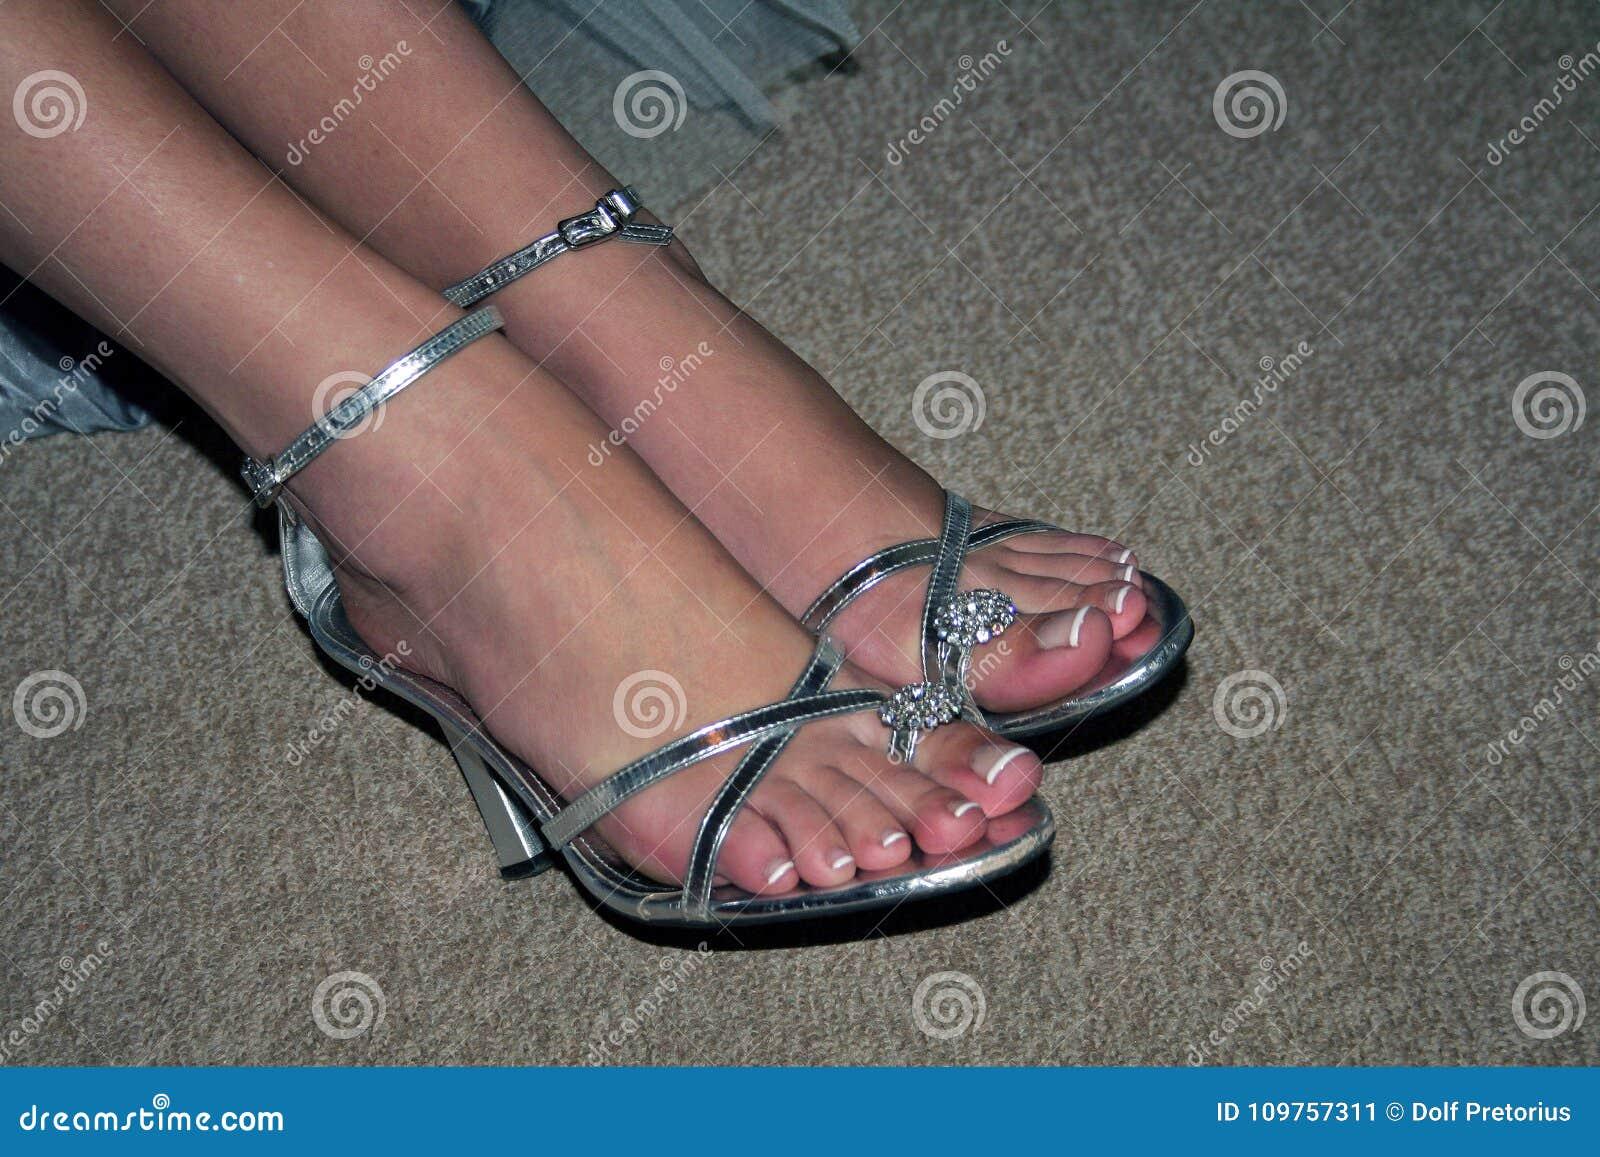 c4f9b0c23cc Εικόνα SLR των ποδιών και των αστραγάλων γυναικών ` s στα φανταχτερά ασημένια  παπούτσια με τα υψηλά τακούνια Πόδια το ένα εκτός από το άλλο Λεπτά λουριά  ...